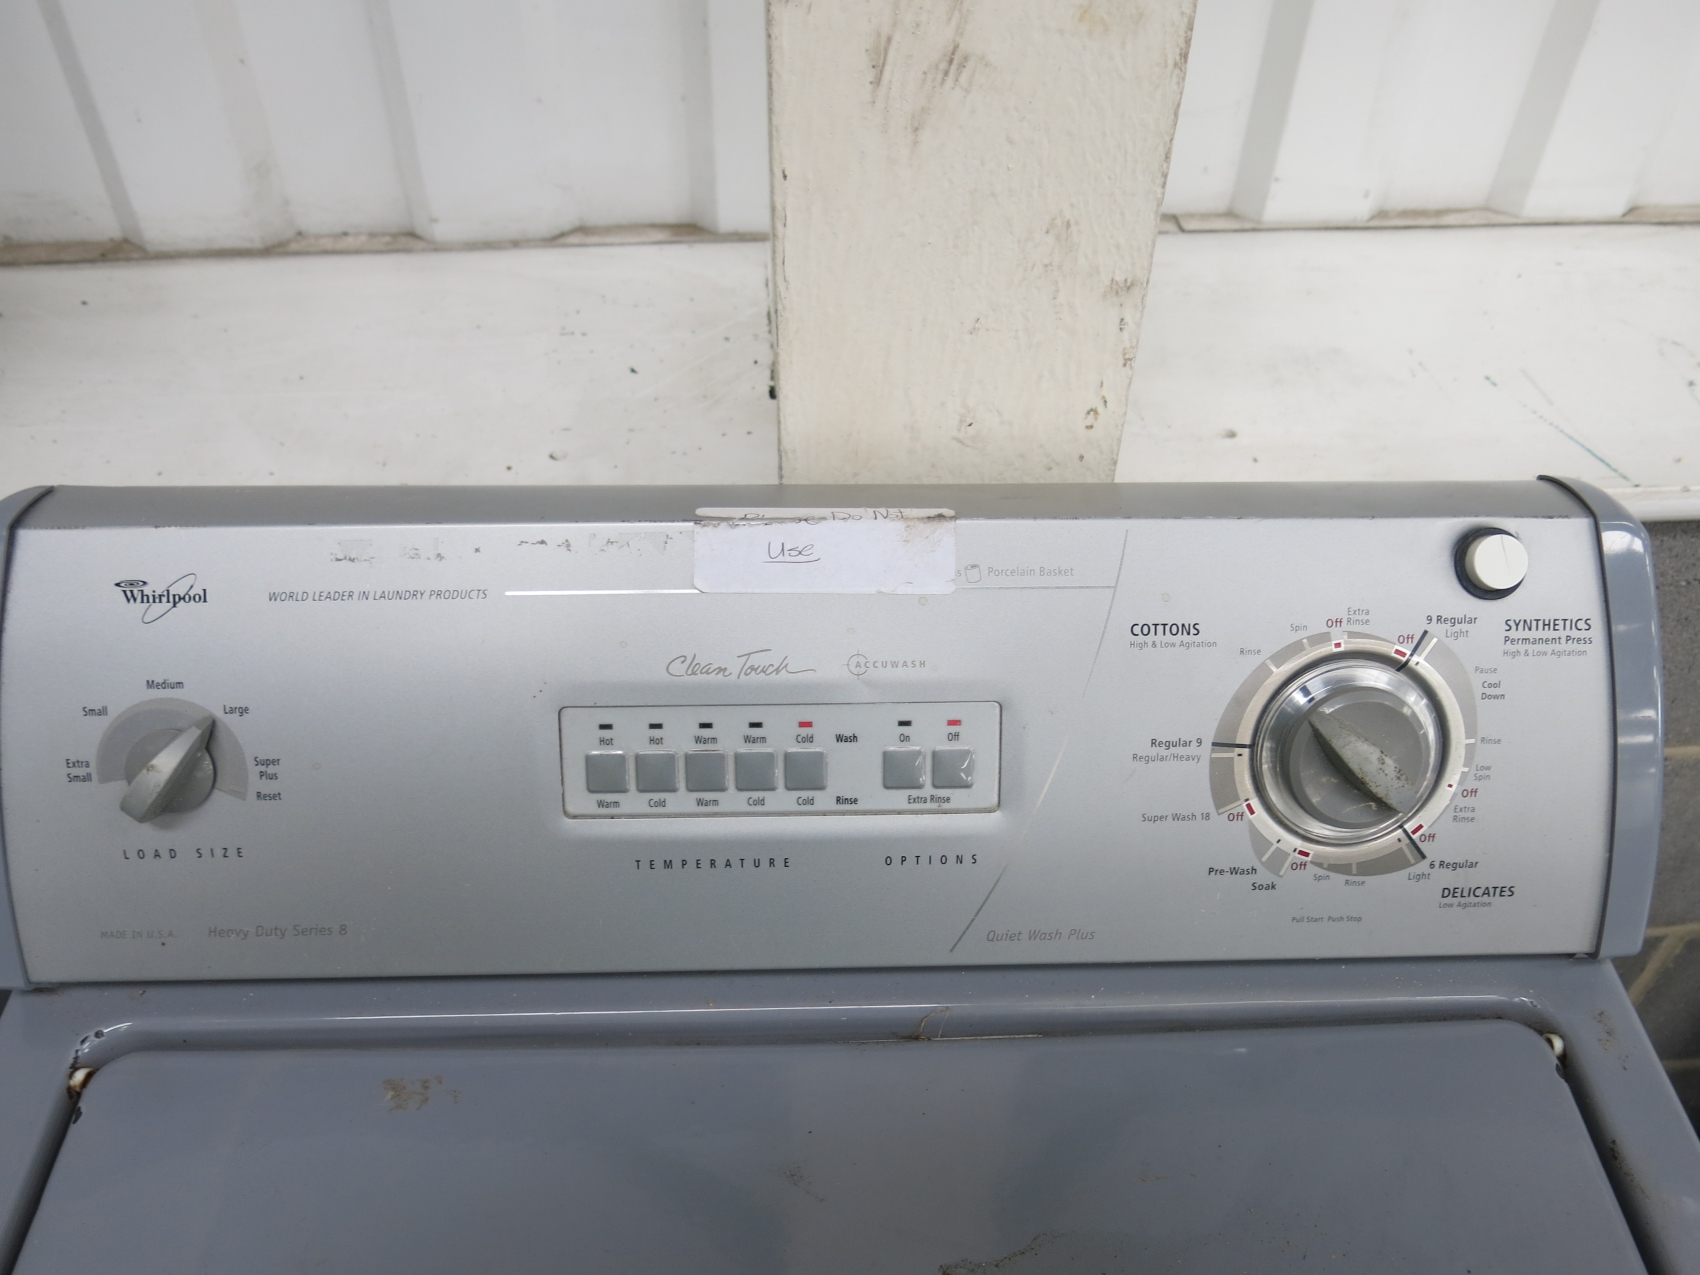 whirlpool heavy duty series 8 washing machine manual